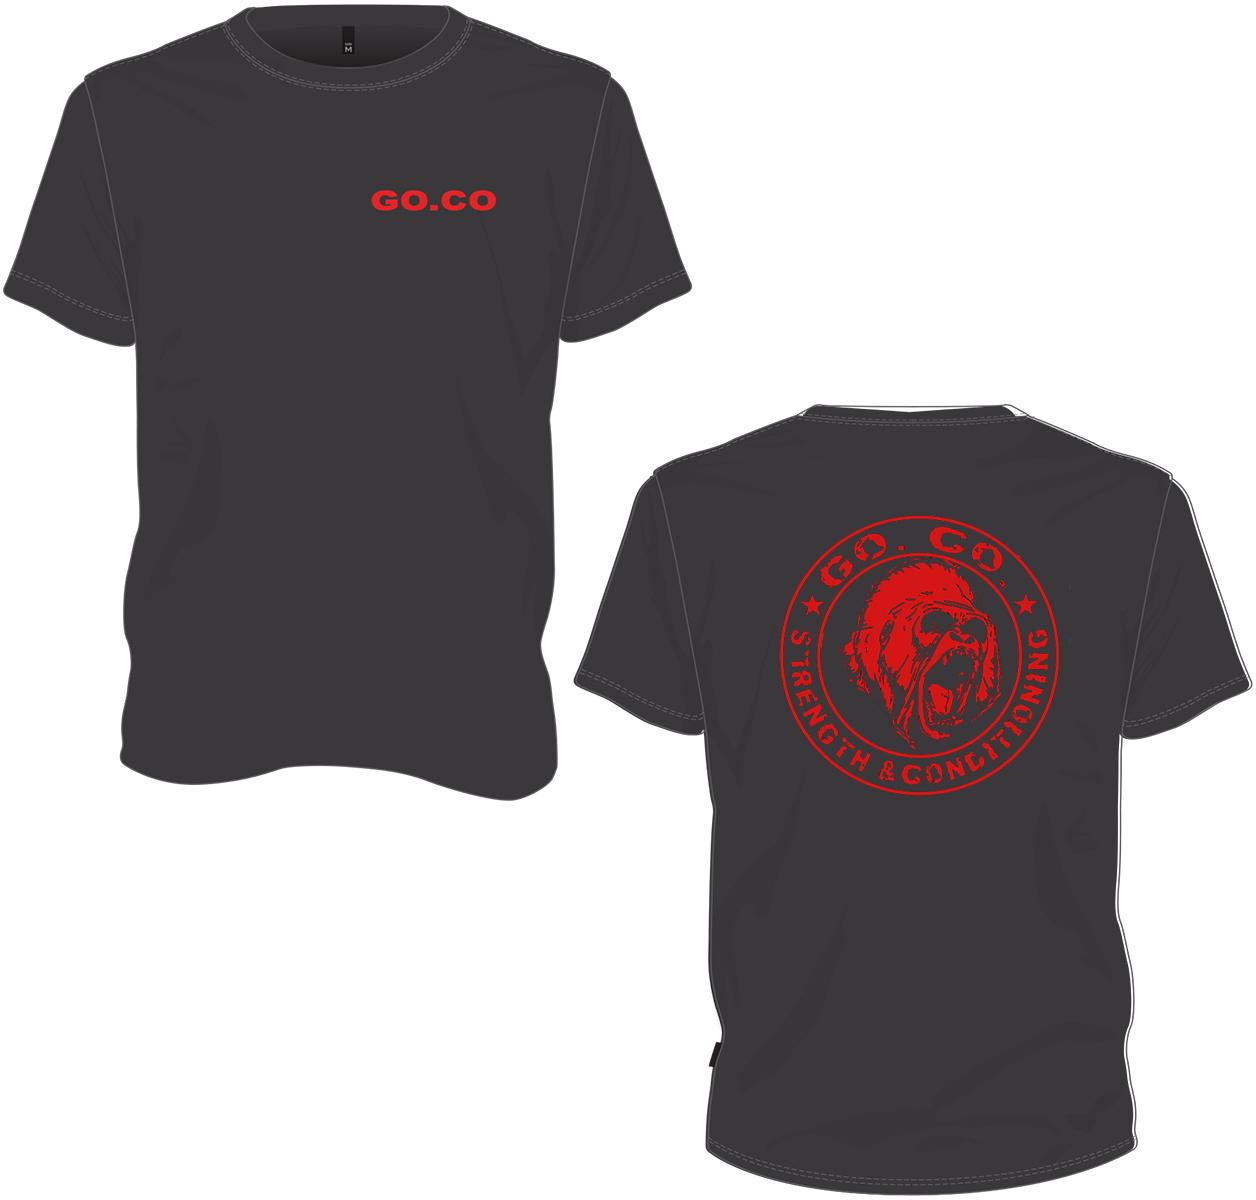 GOCO-Shirt-Chest.jpg